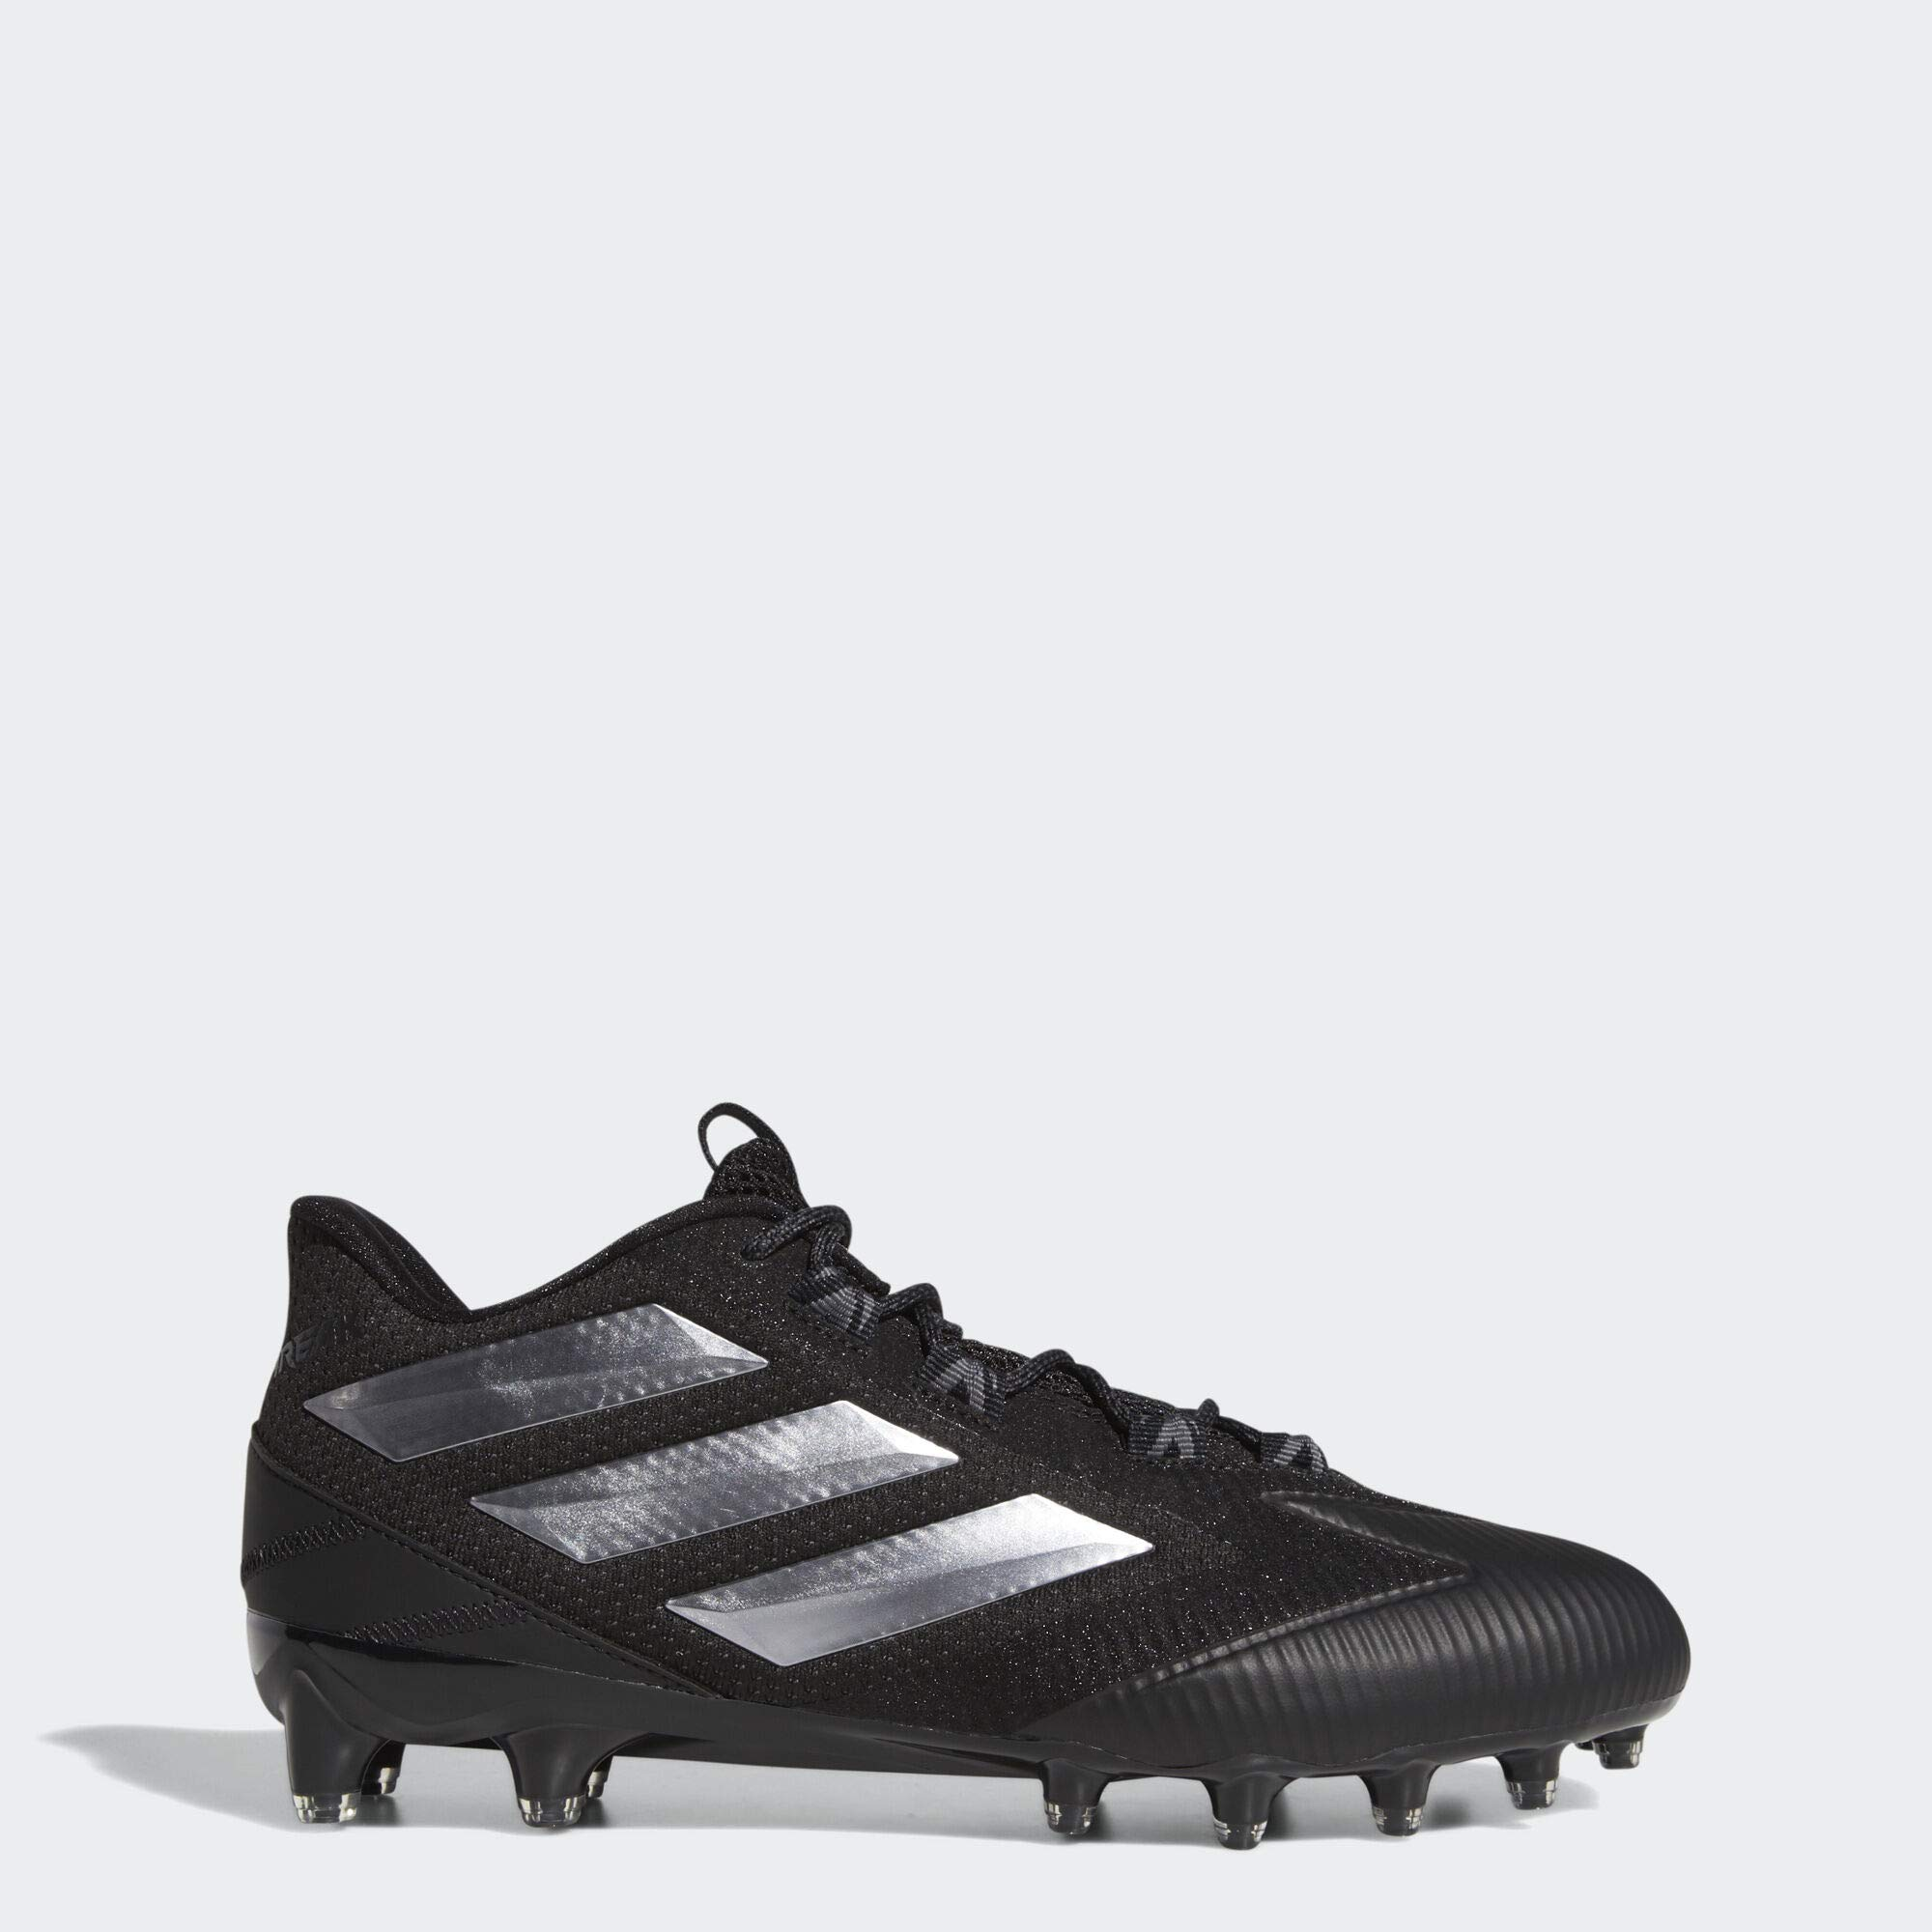 adidas Men's Freak Carbon Low Football Shoe, Black/Night Metallic/Grey, 9.5 M US by adidas